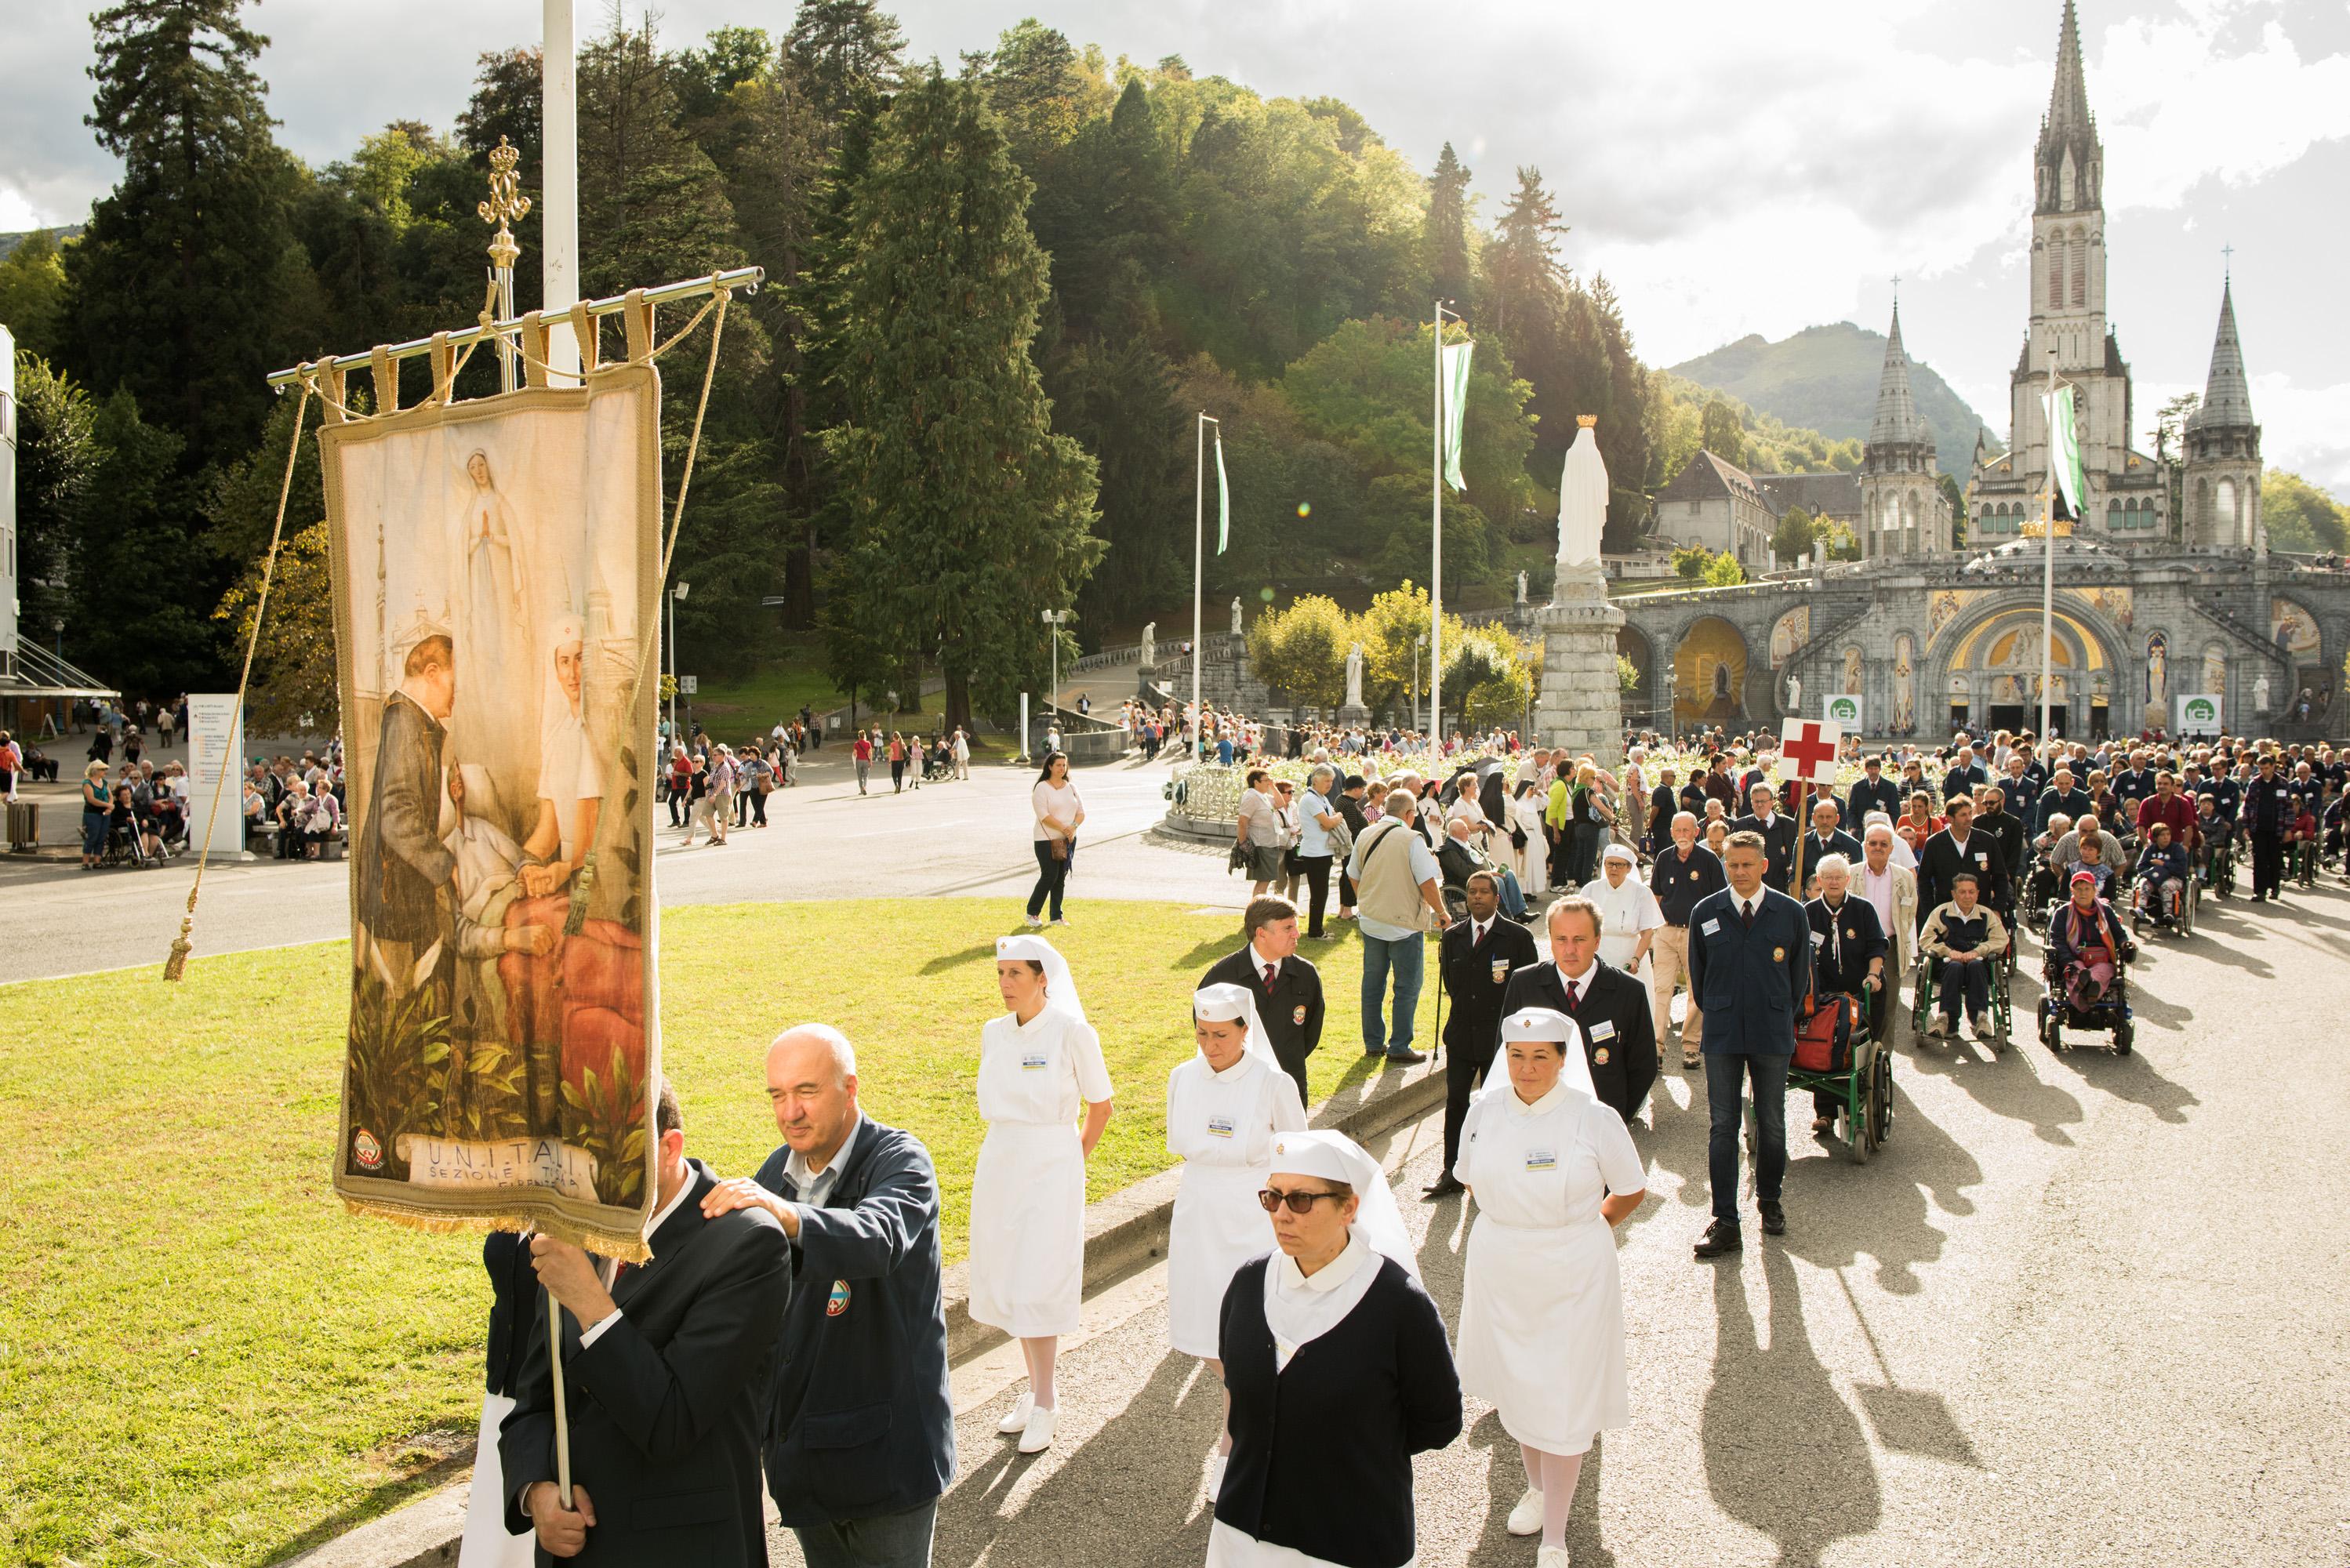 Calendrier Des Pelerinages Lourdes 2019.Pelerinage National Italien De L Unitalsi